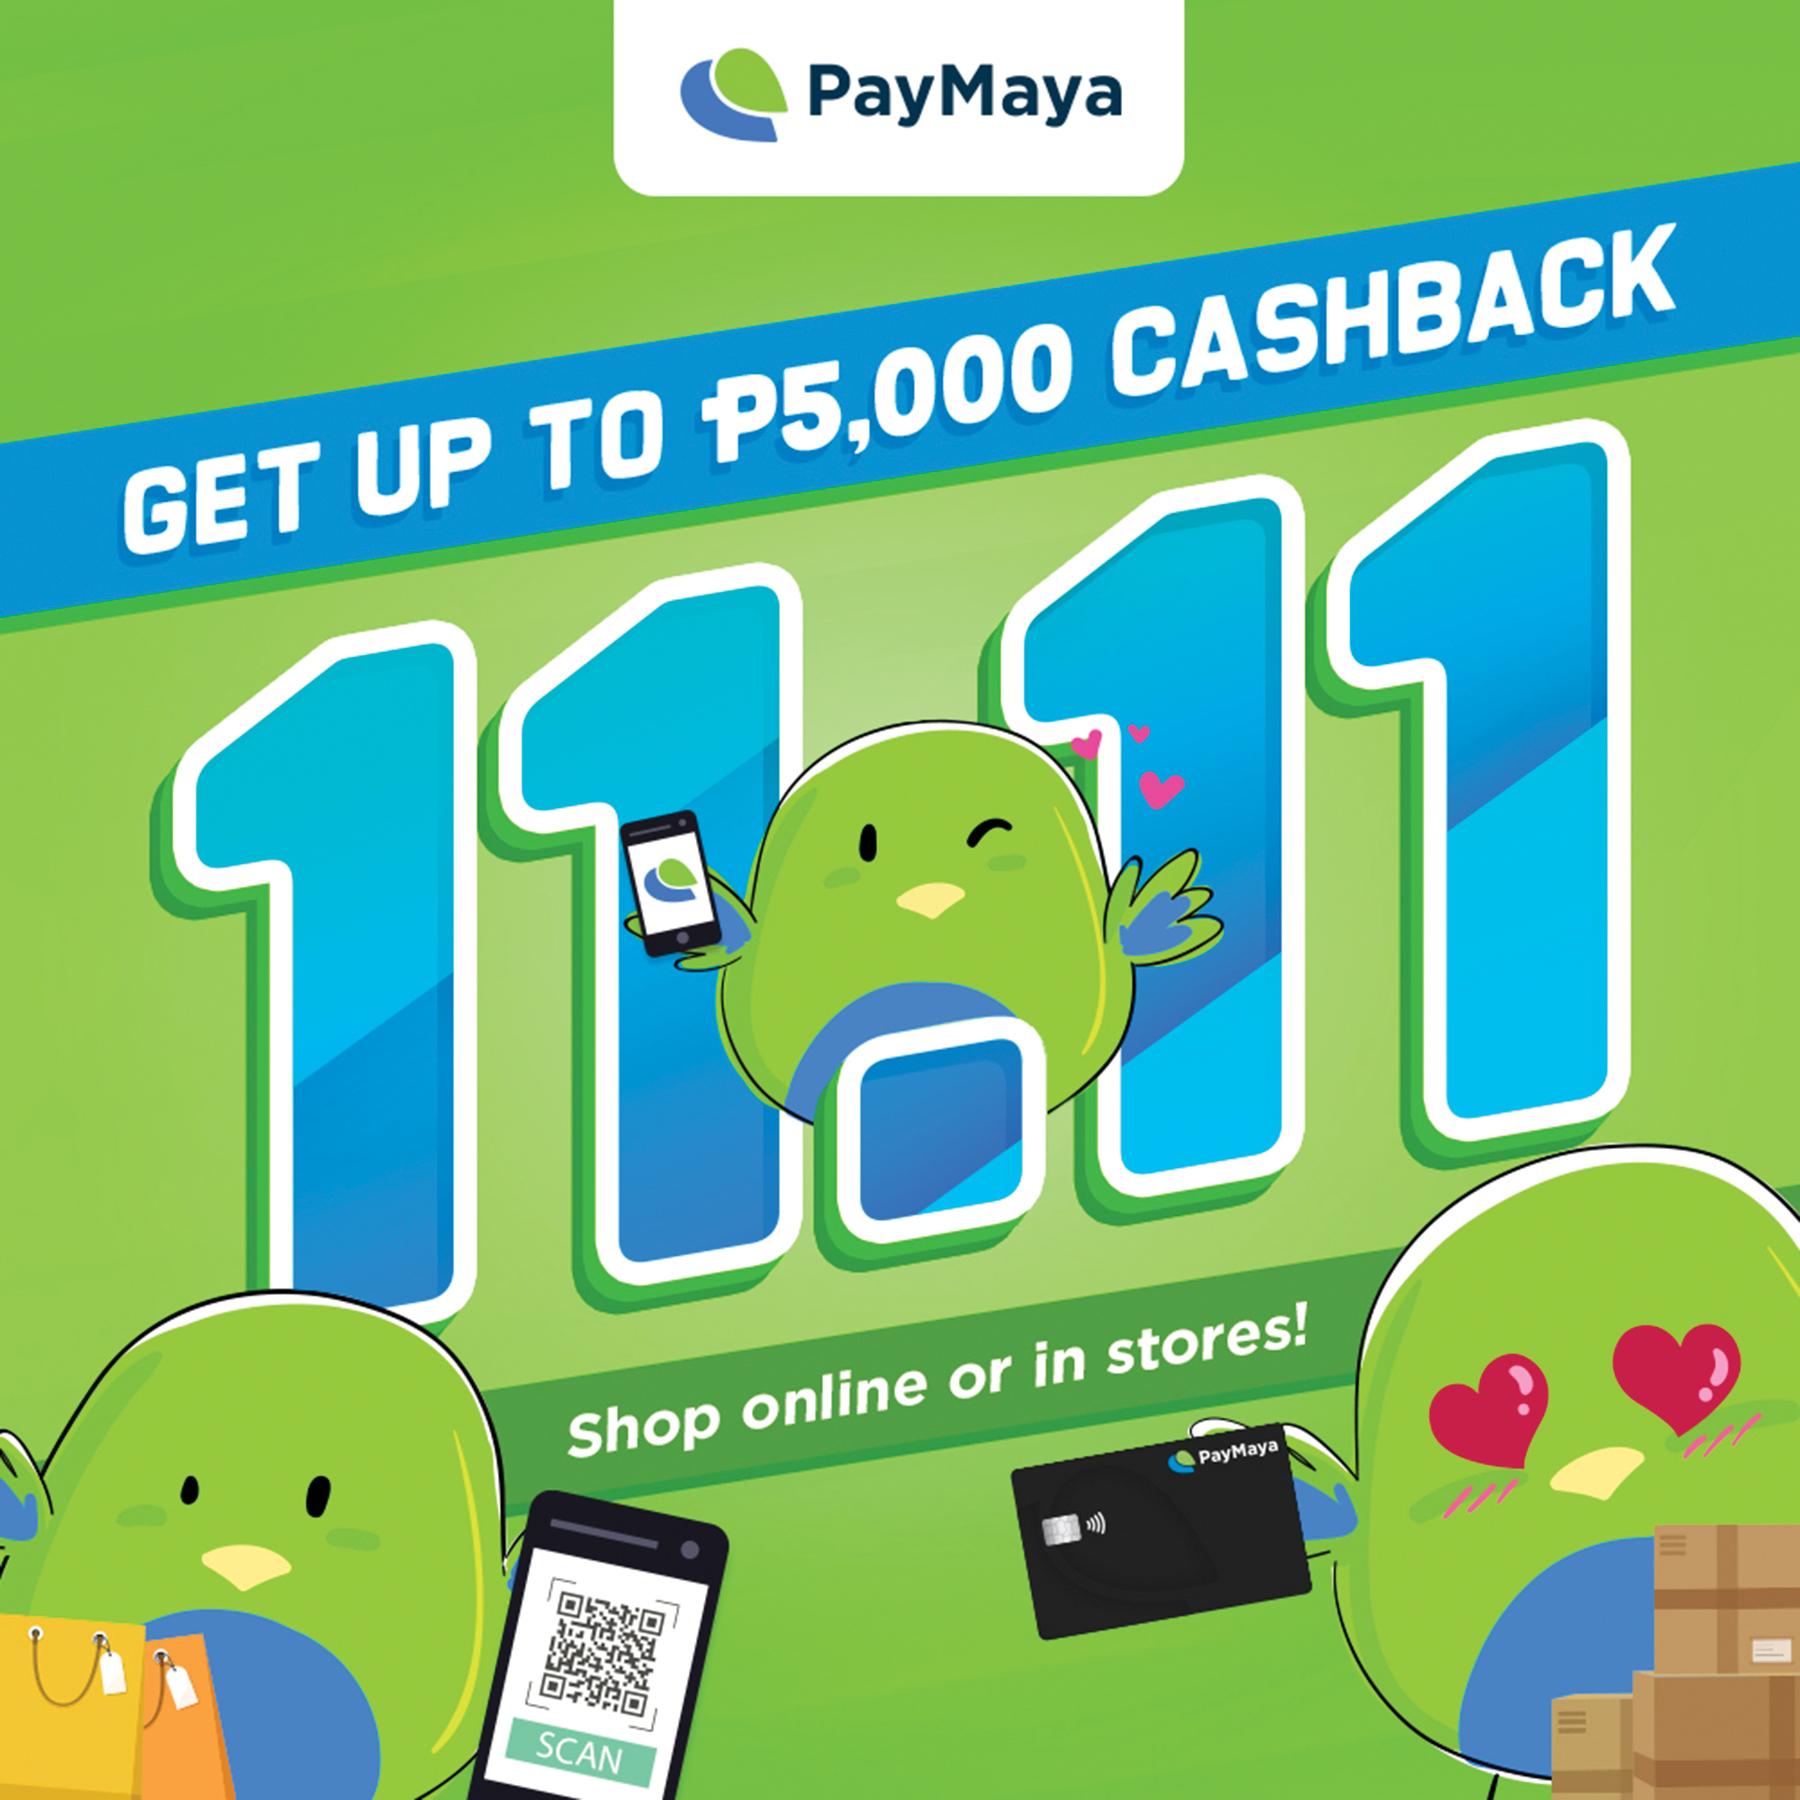 Basta Shopping This 11-11, Don't Pay Cash. PayMaya!